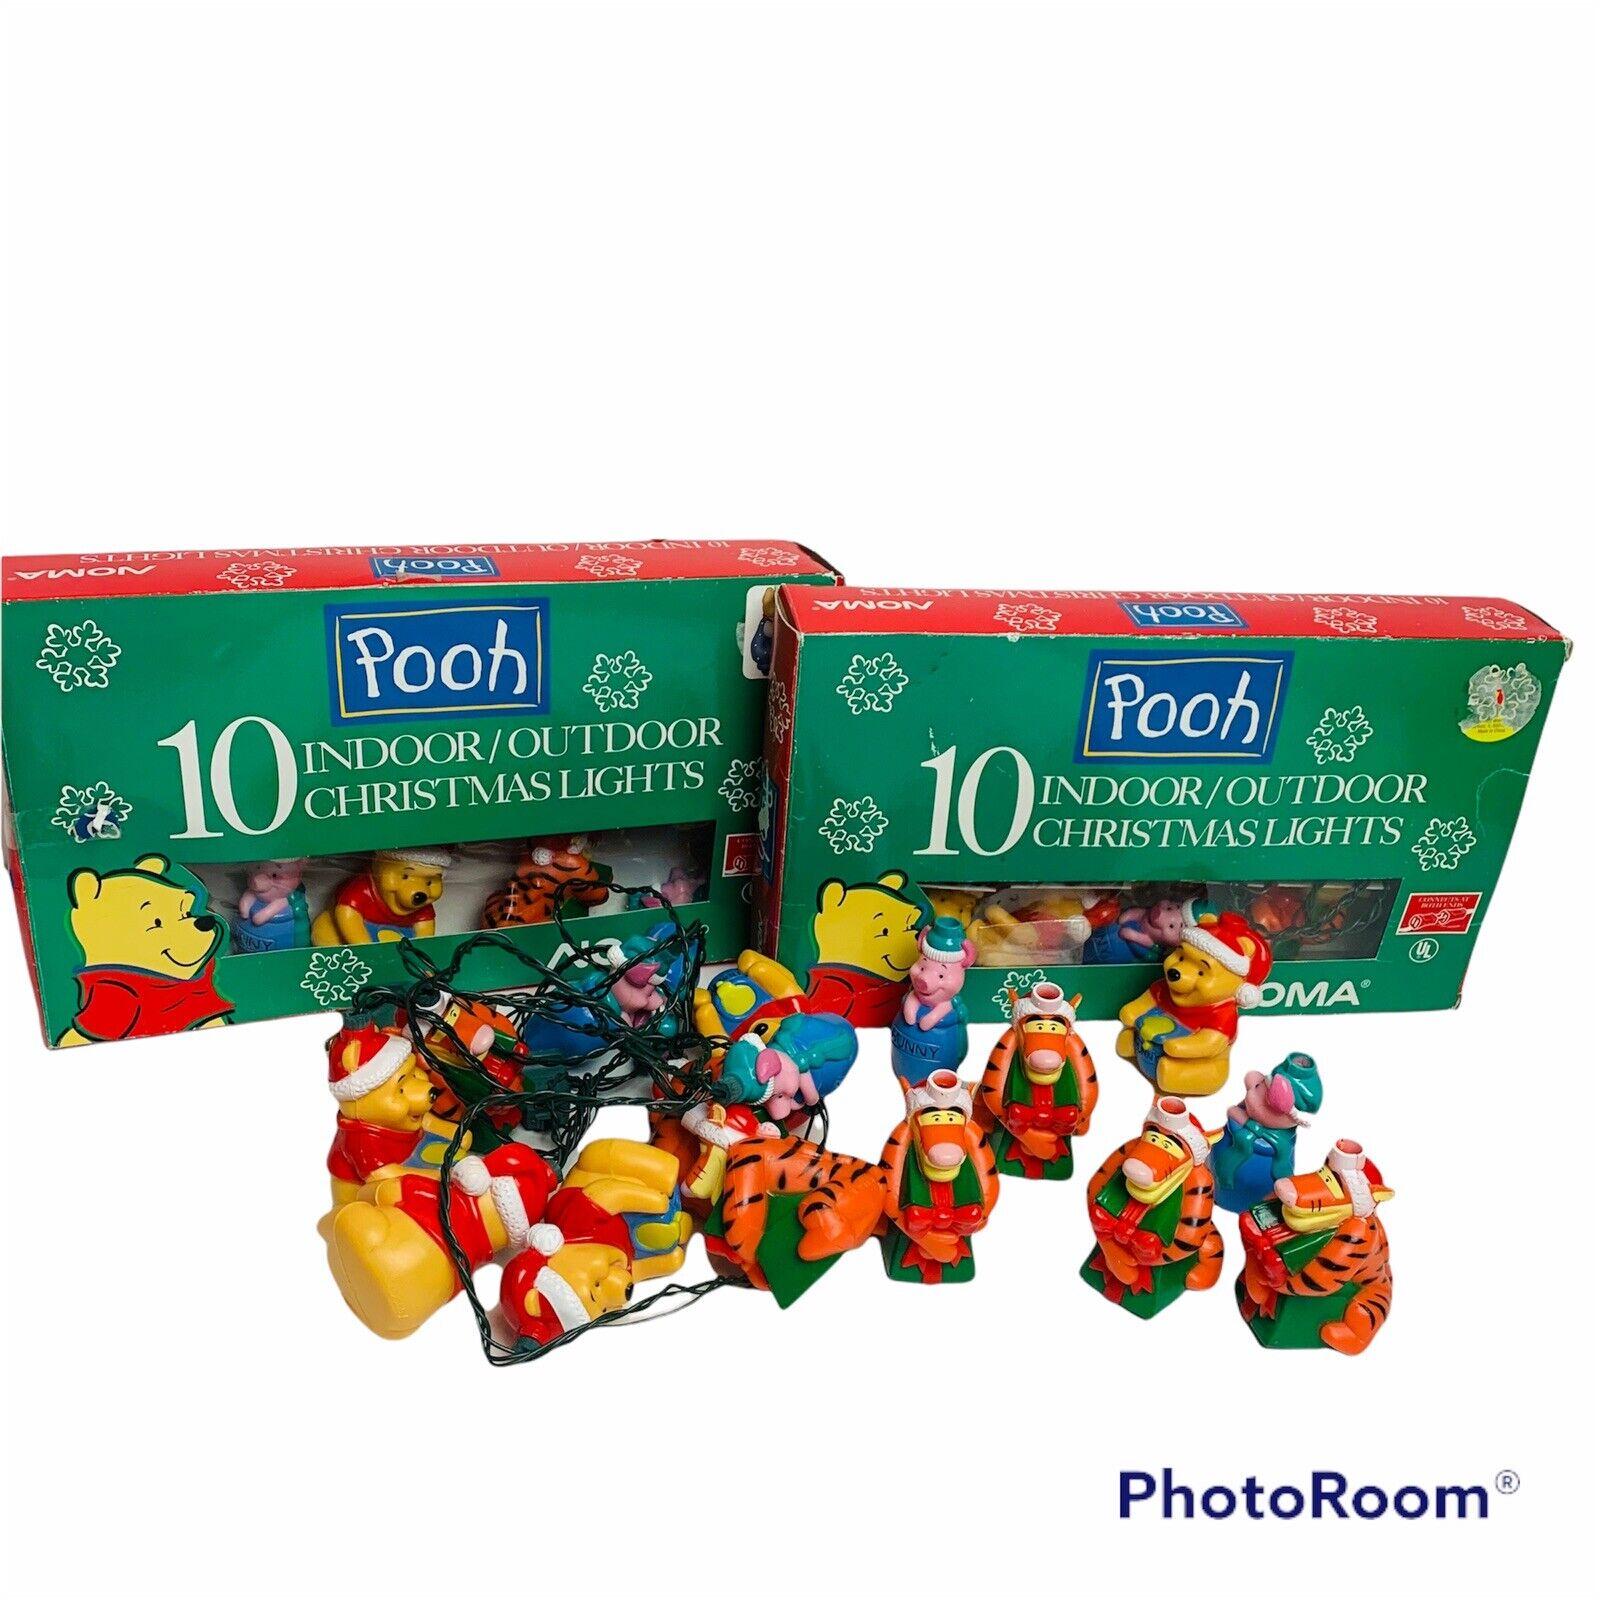 3 Disney Pooh Tigger Novelty Holiday String Lights 10 Count Indoor Outdoor